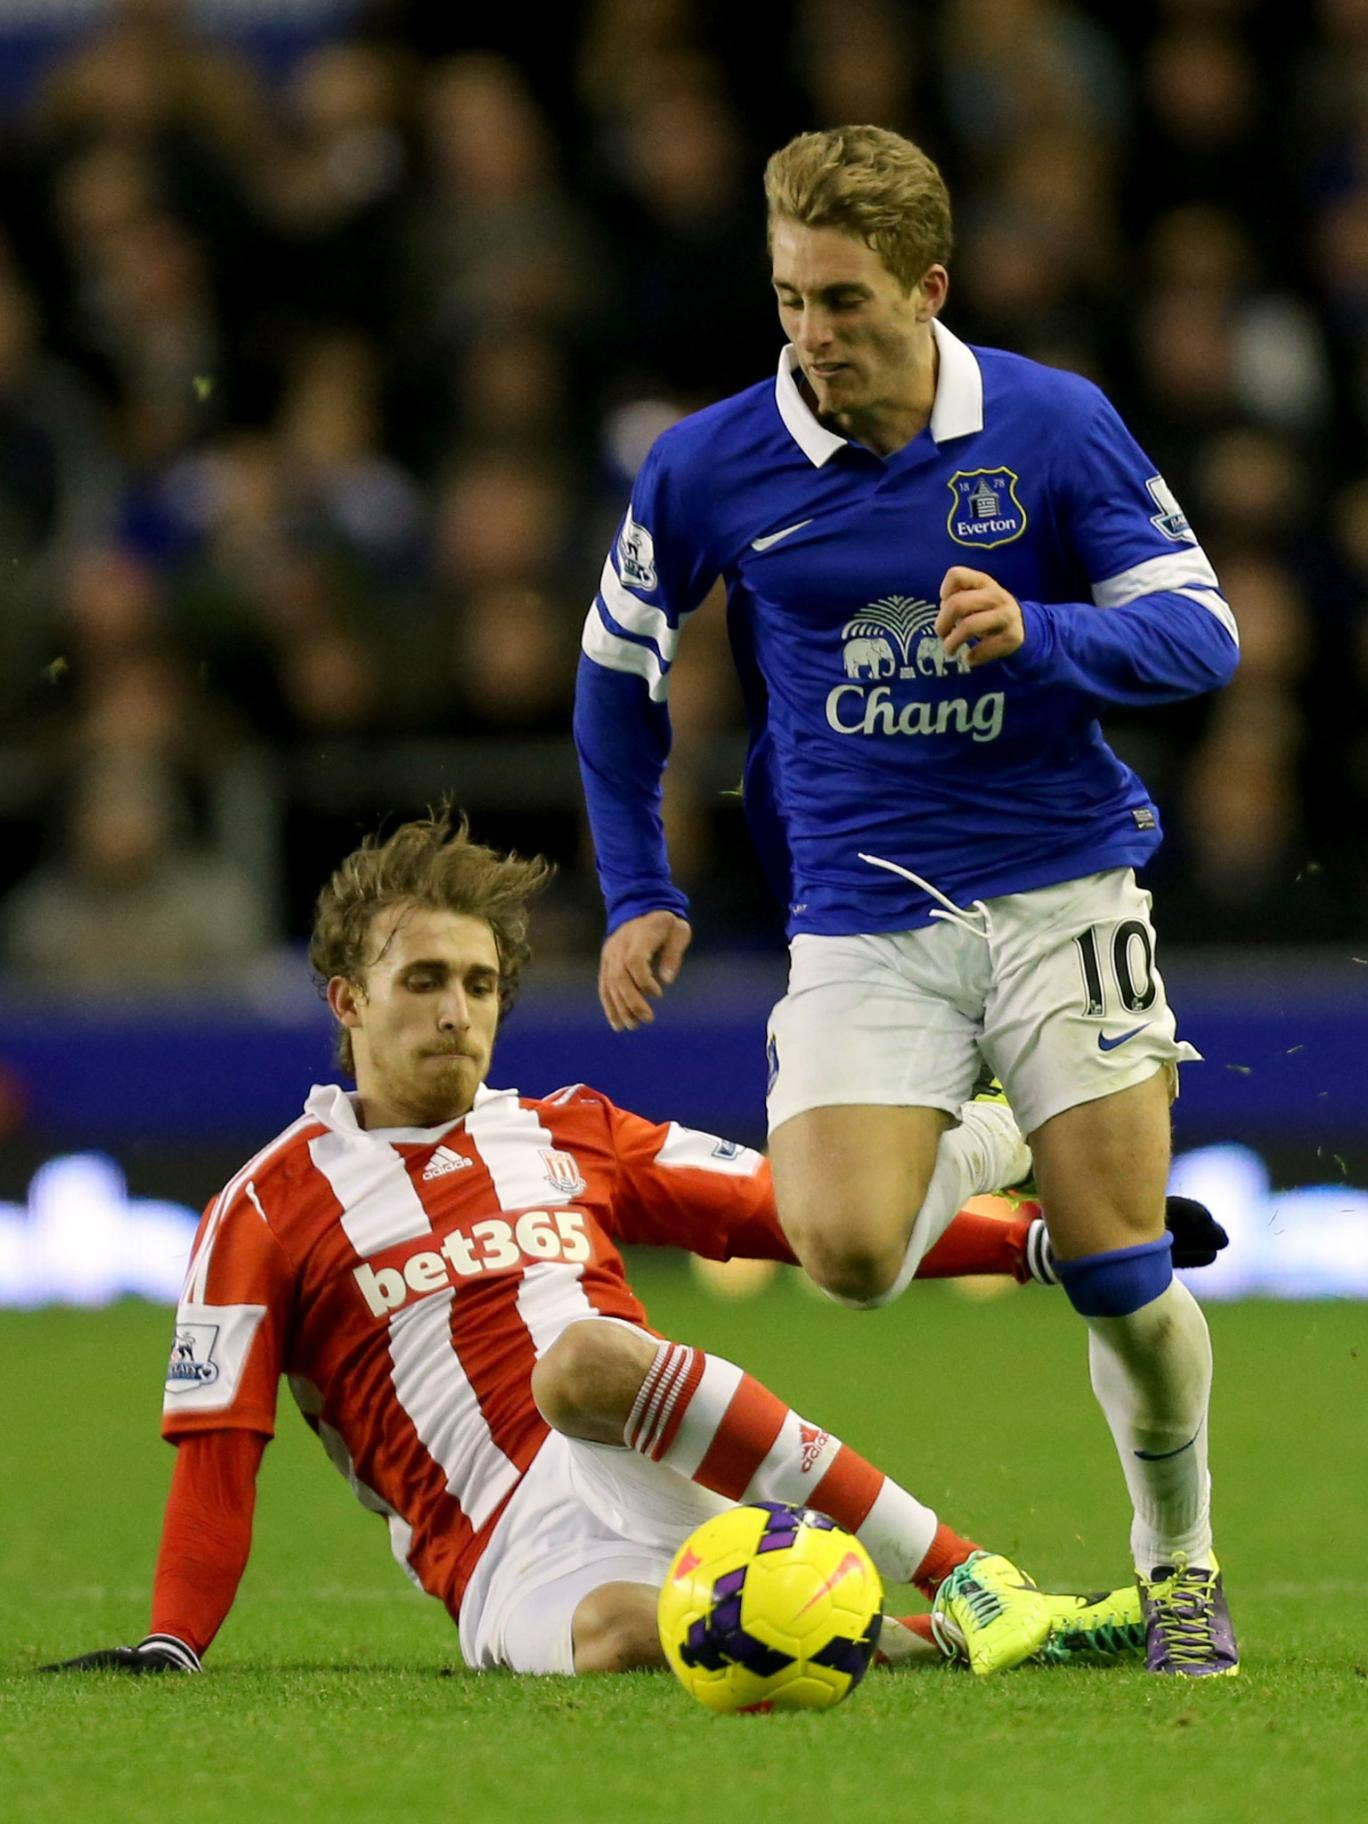 Gerard Deulofeu on the ball for Everton against Stoke City's Marc Muniesa